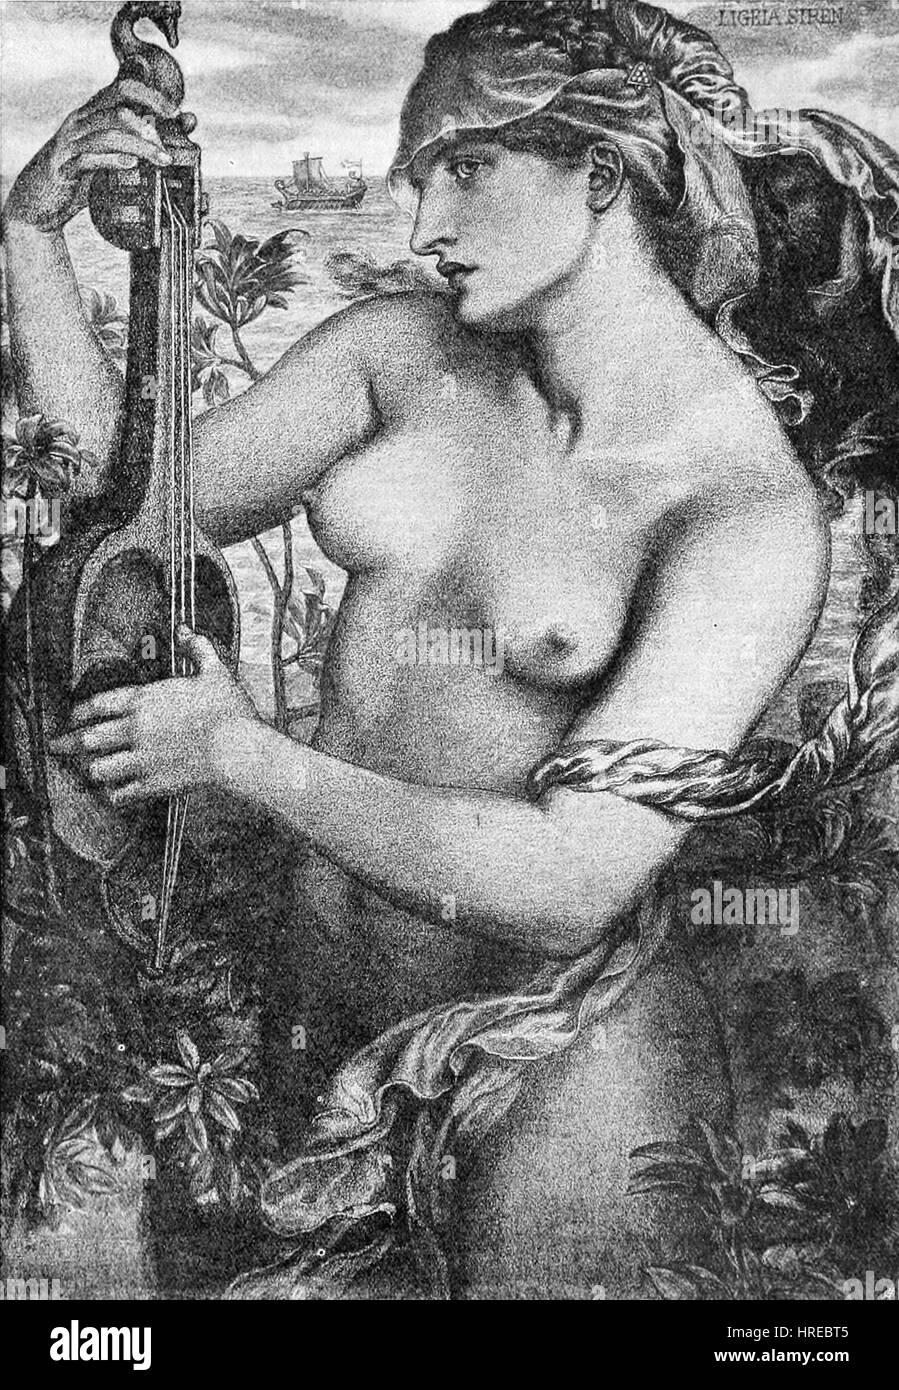 Dante Gabriel Rossetti - Ligeia Sirene Stockfoto